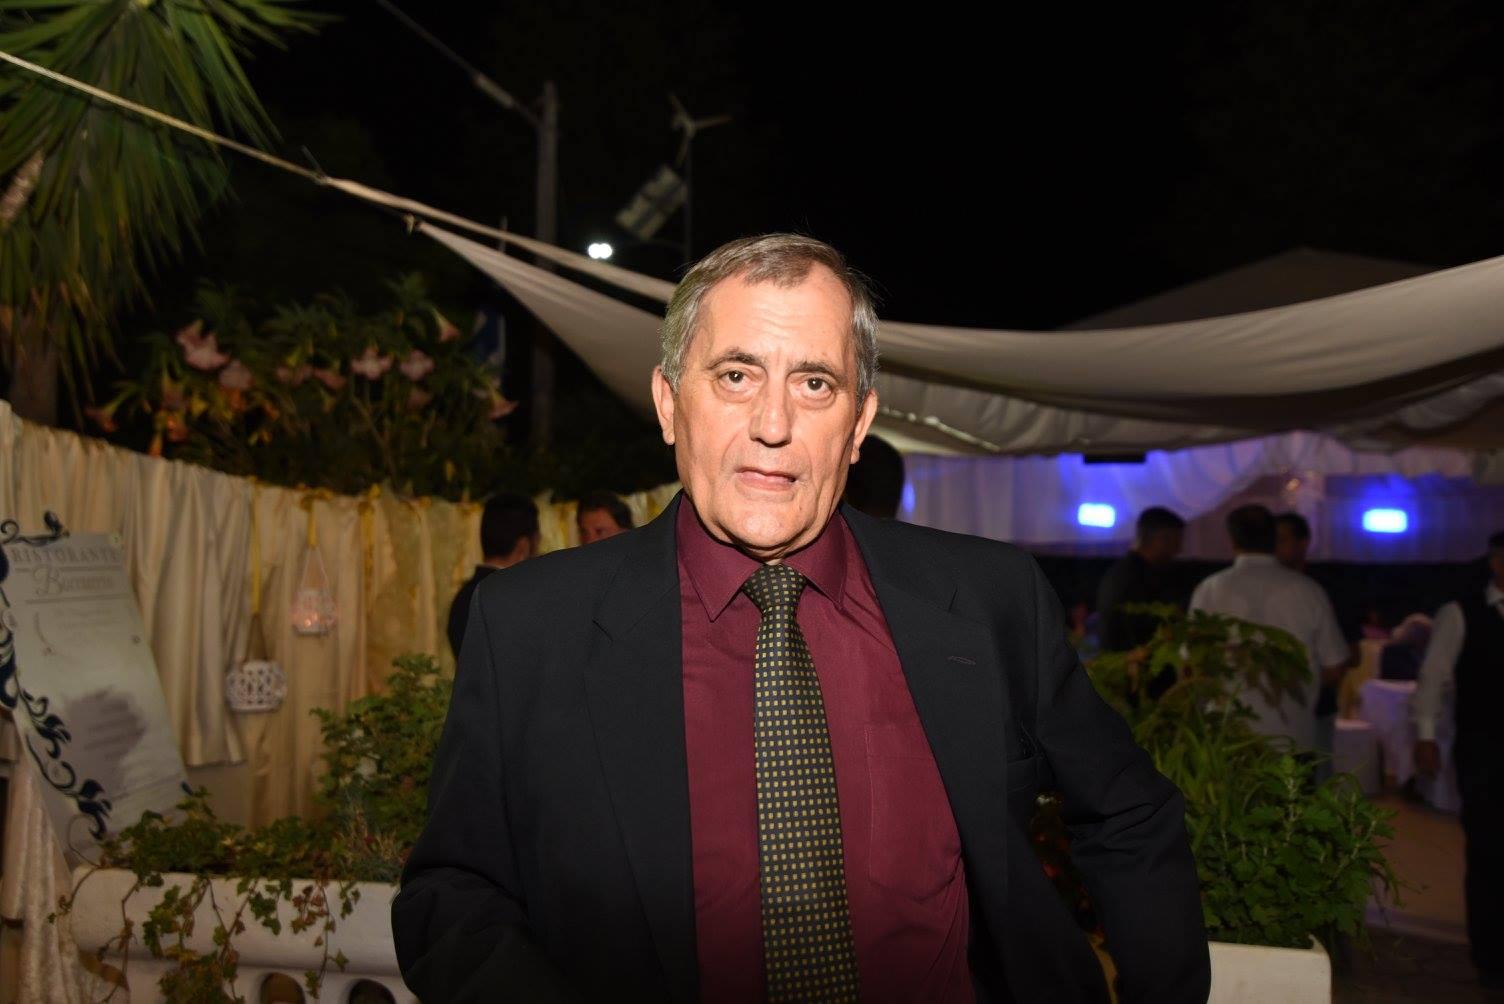 Angelo Sagnelli